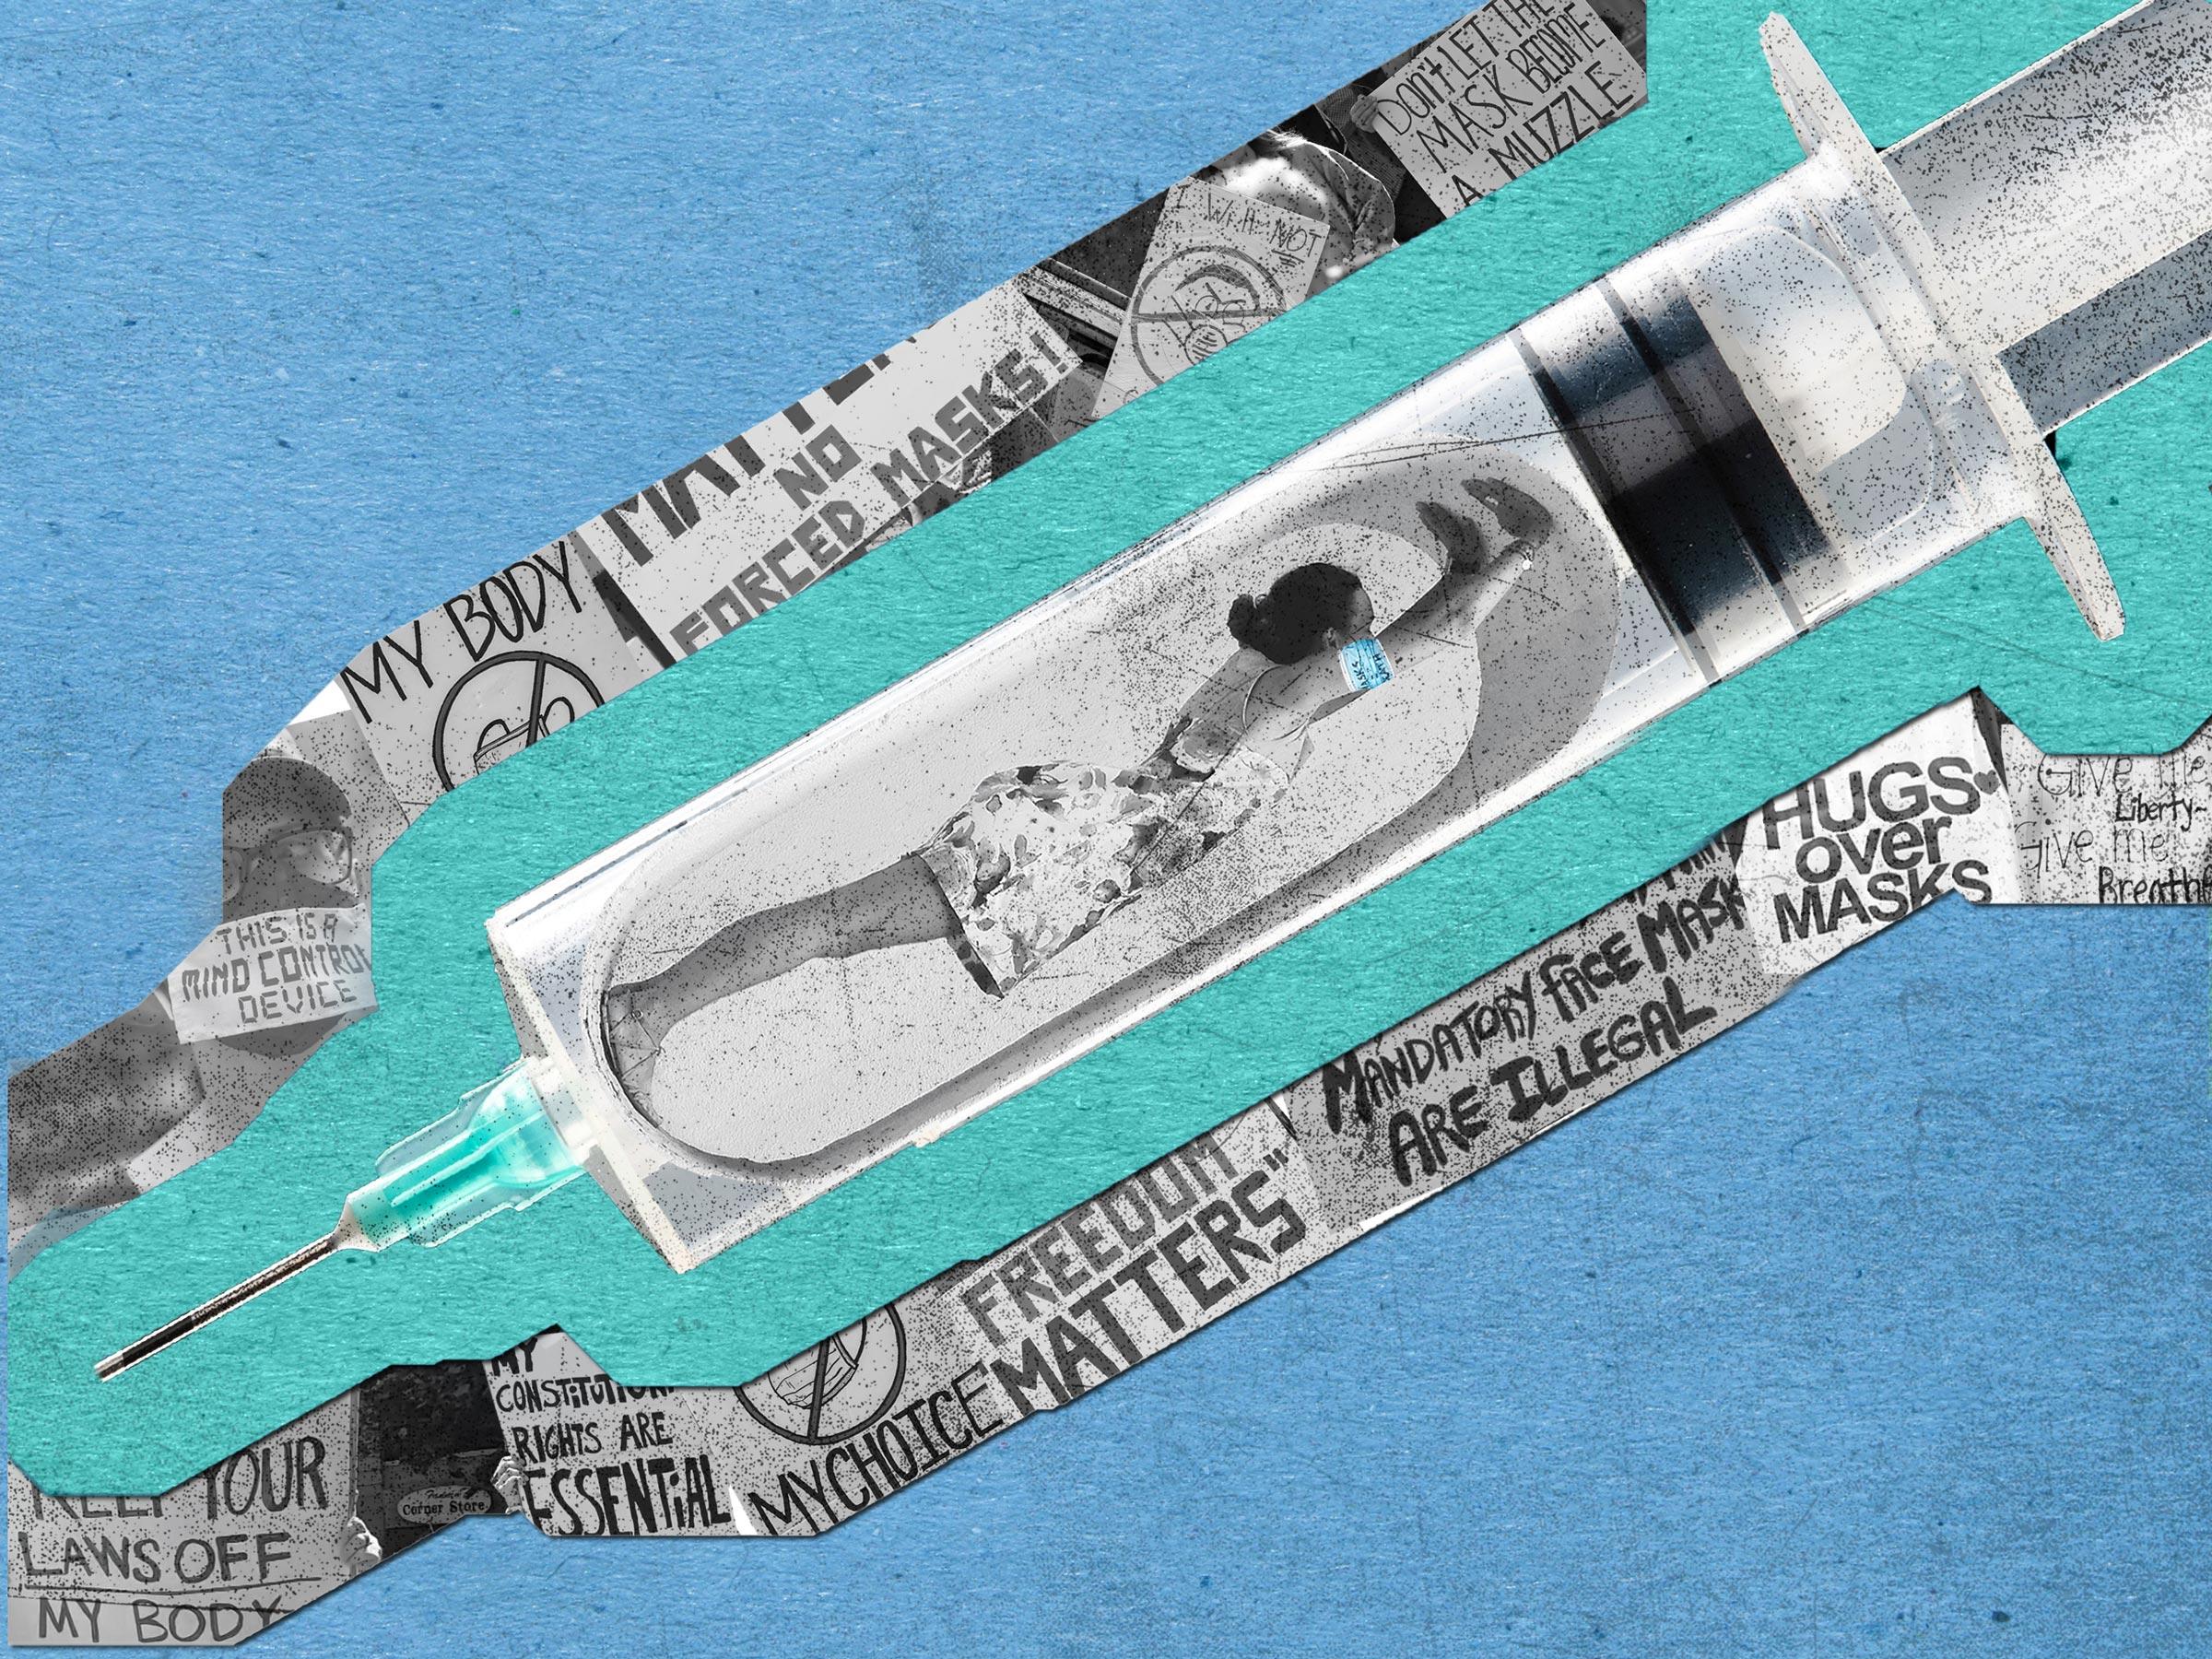 election collage - nurse in syringe